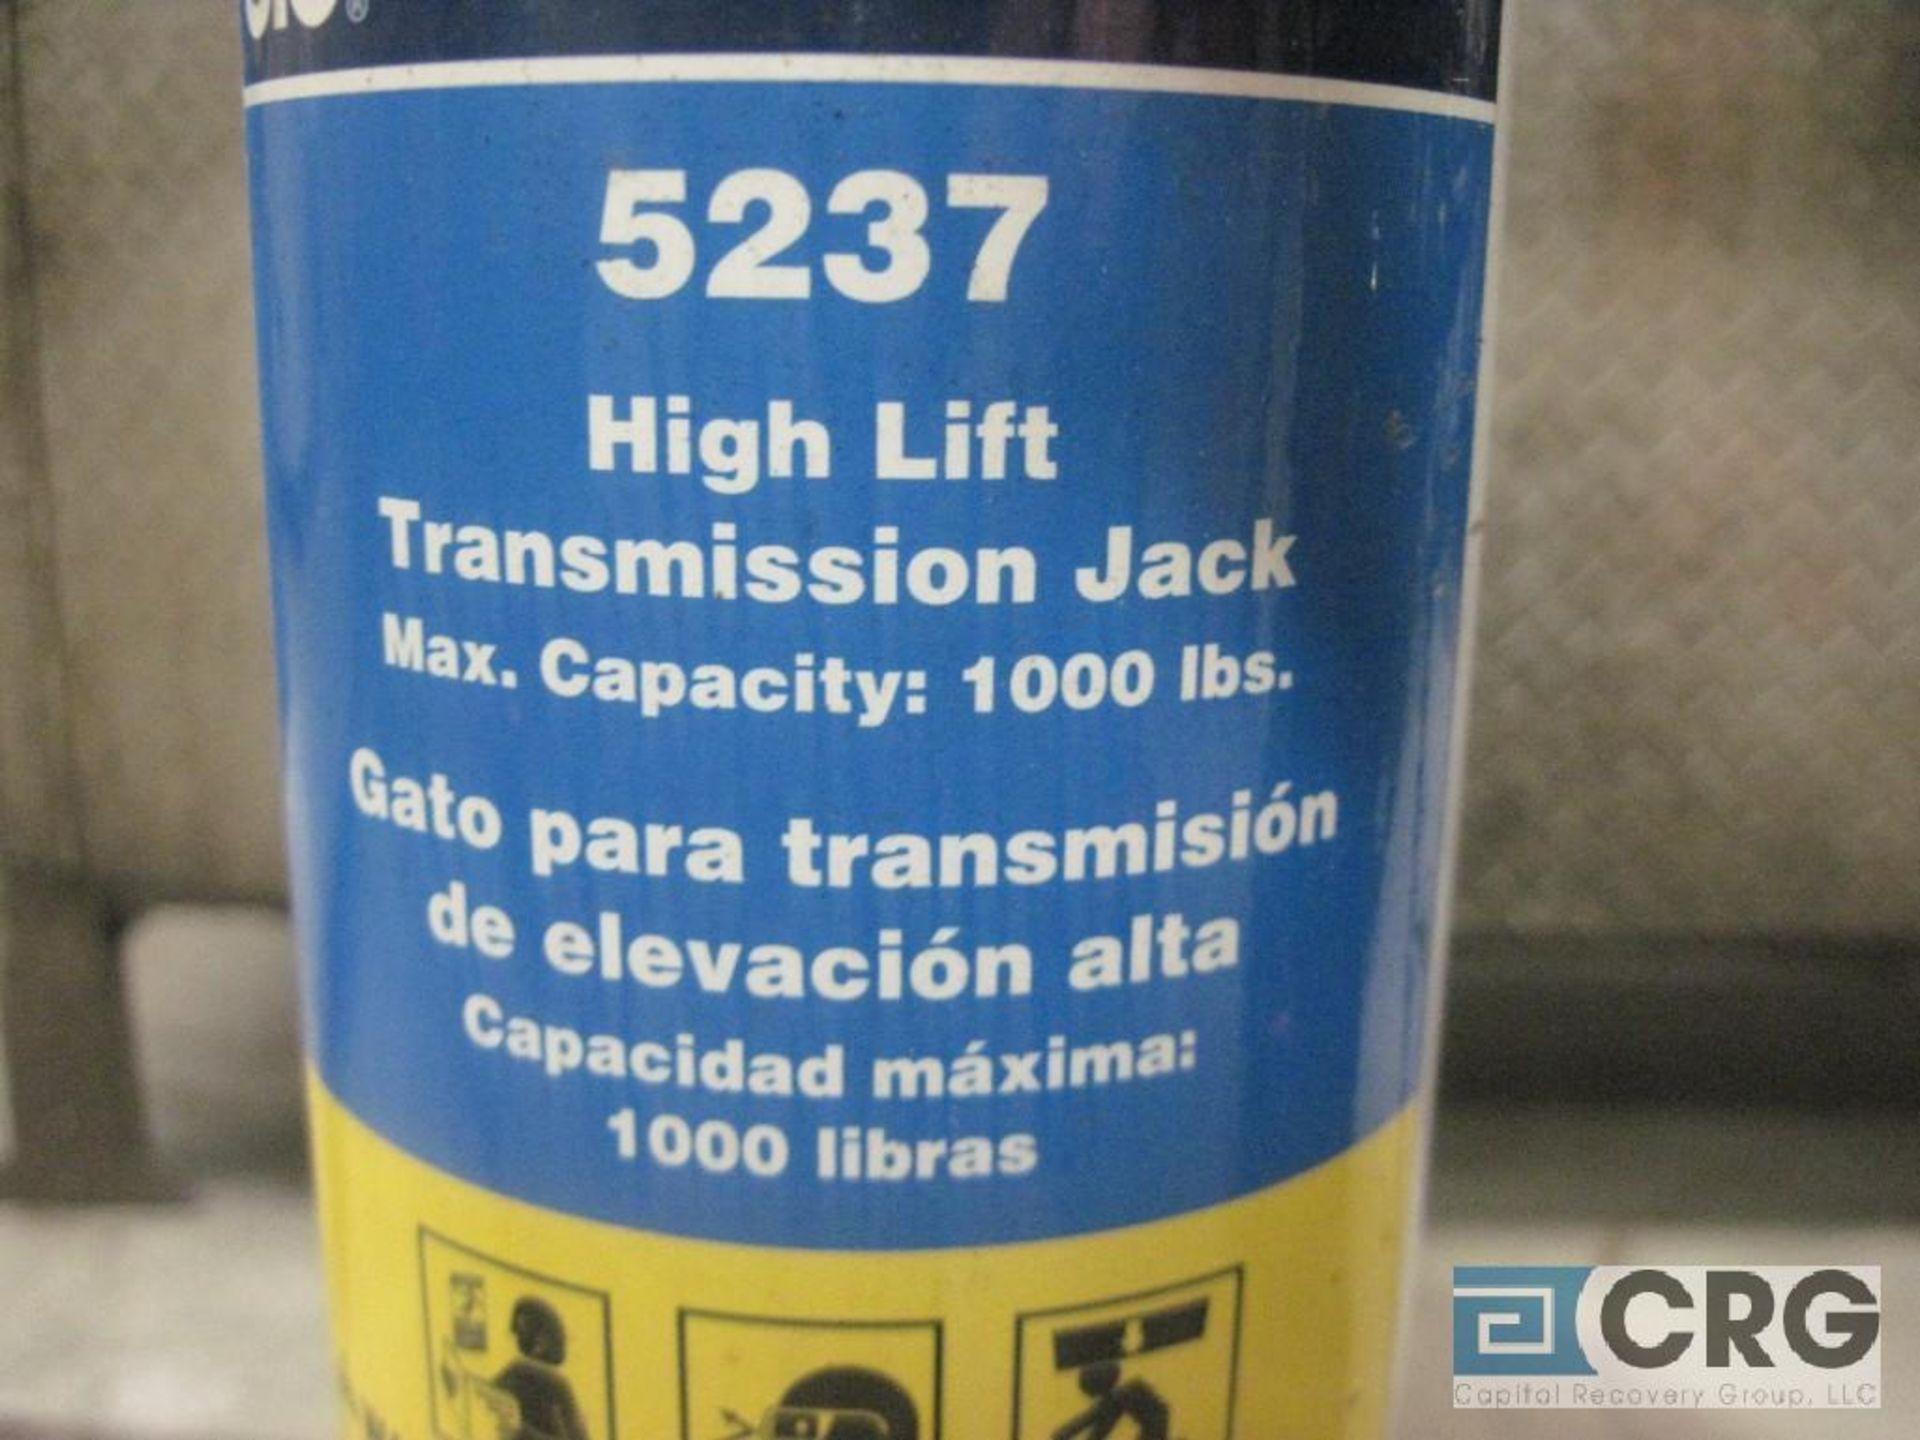 OTC 5237 transmission jack, 1,000 lb. cap. - Image 2 of 2